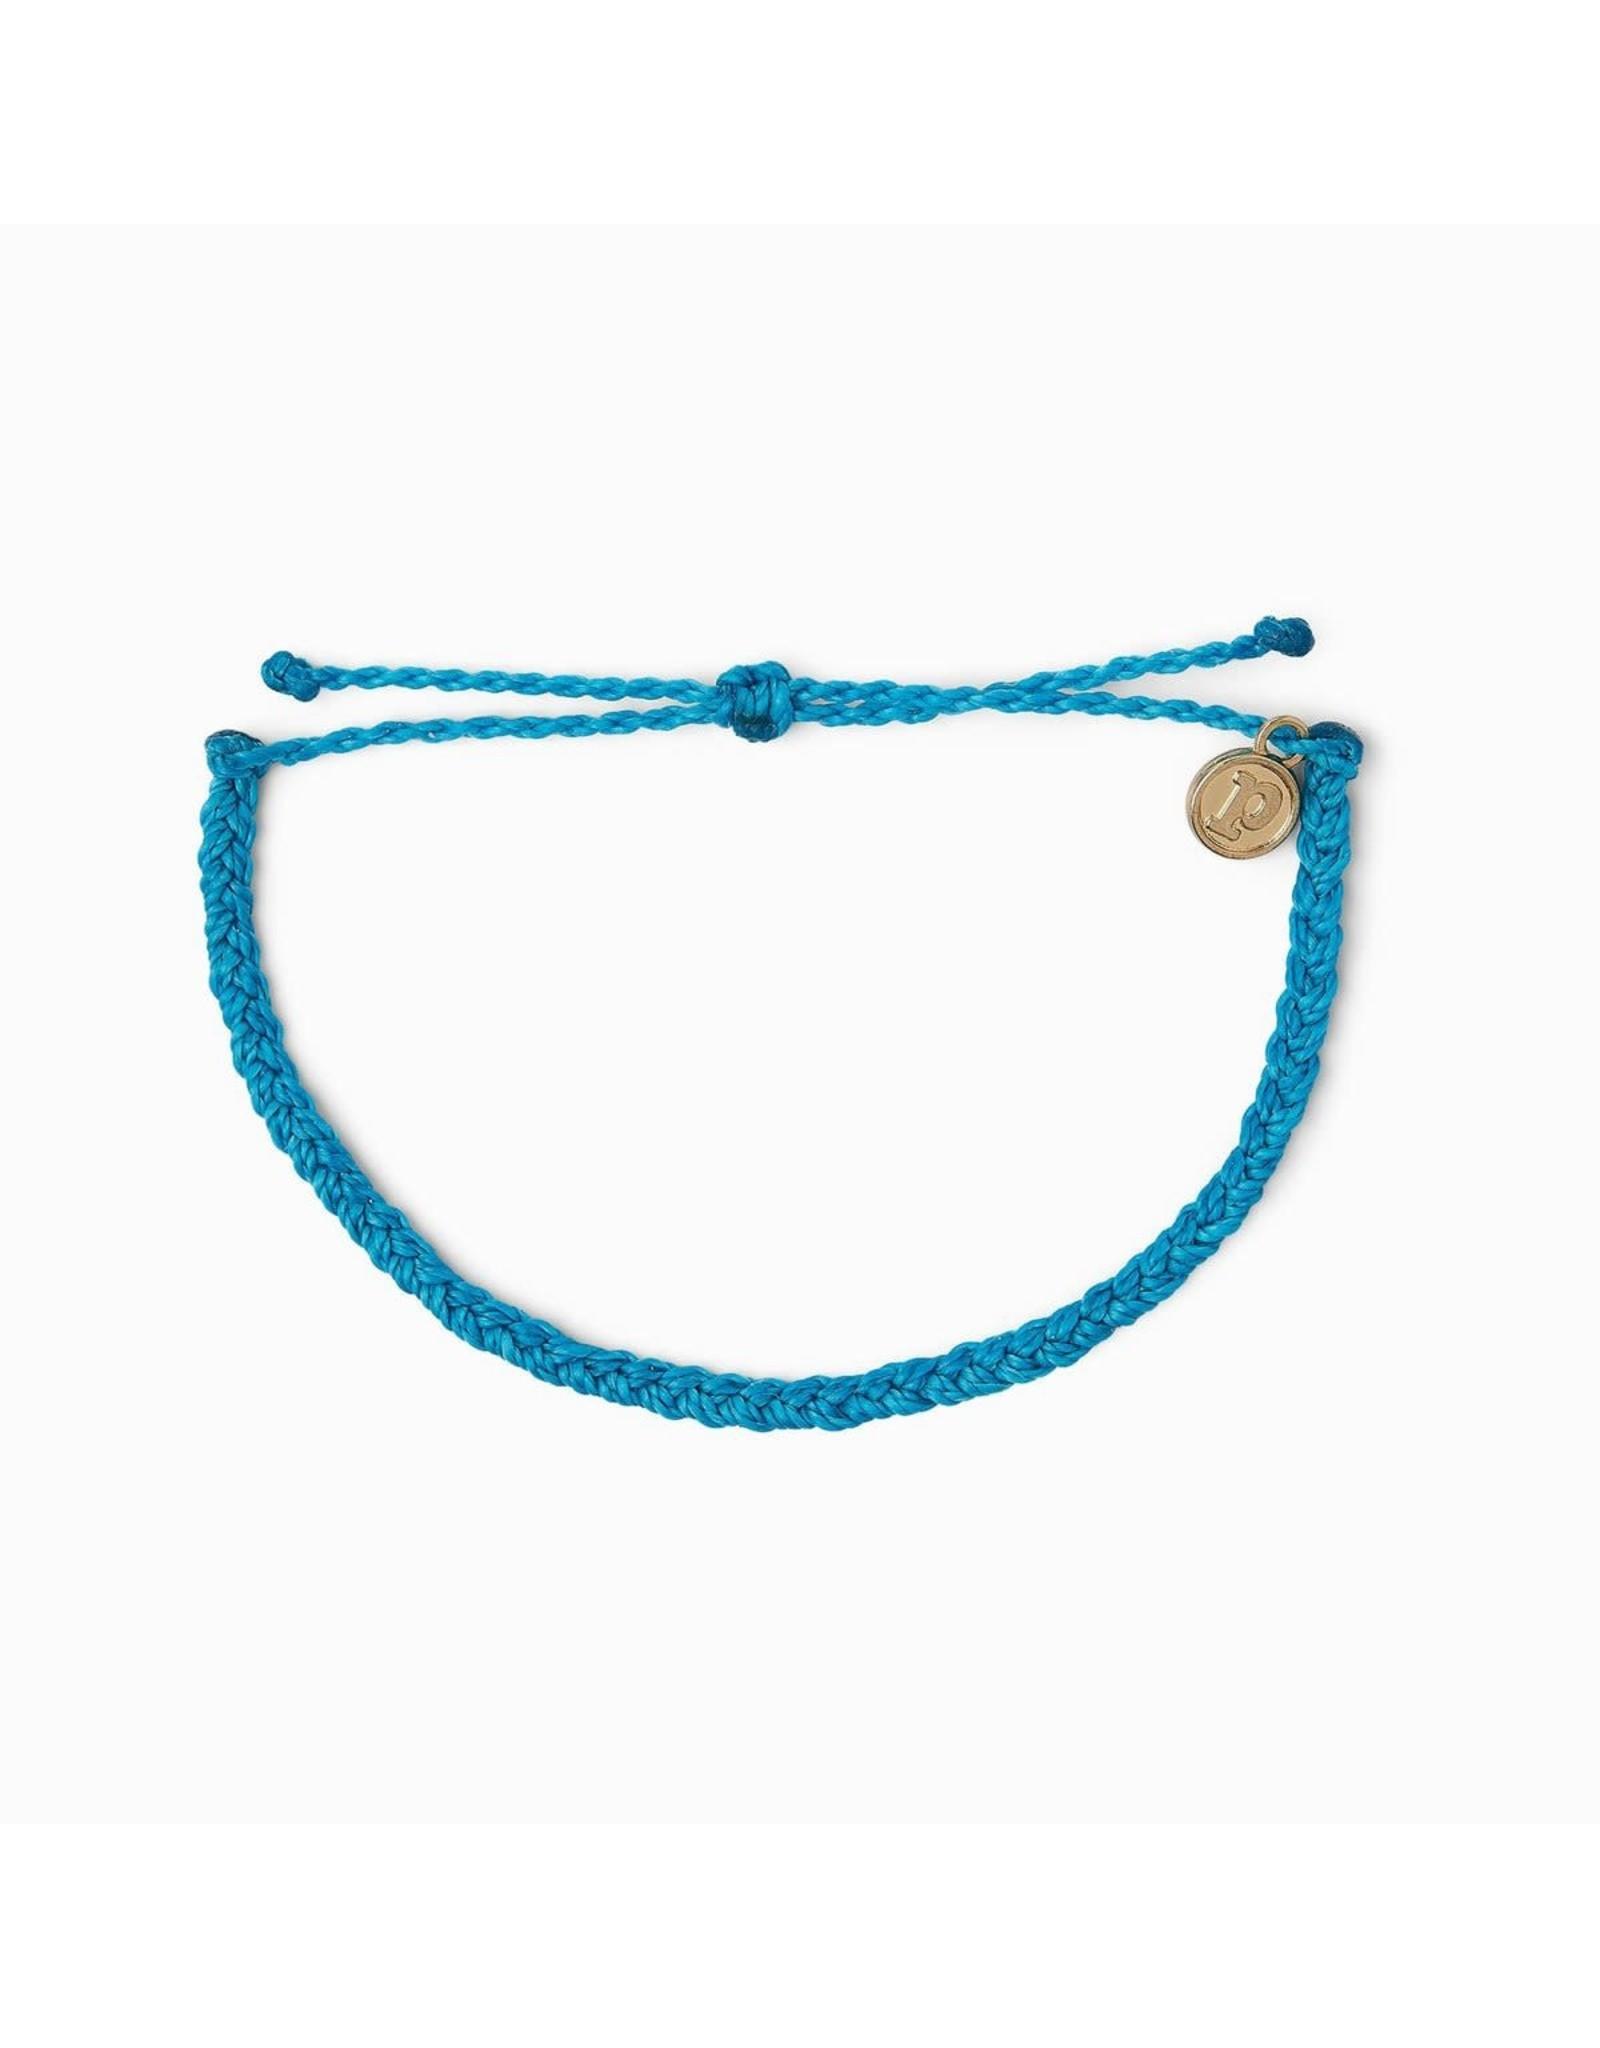 Puravida Bracelets Mini Braided Solid Neon Blue